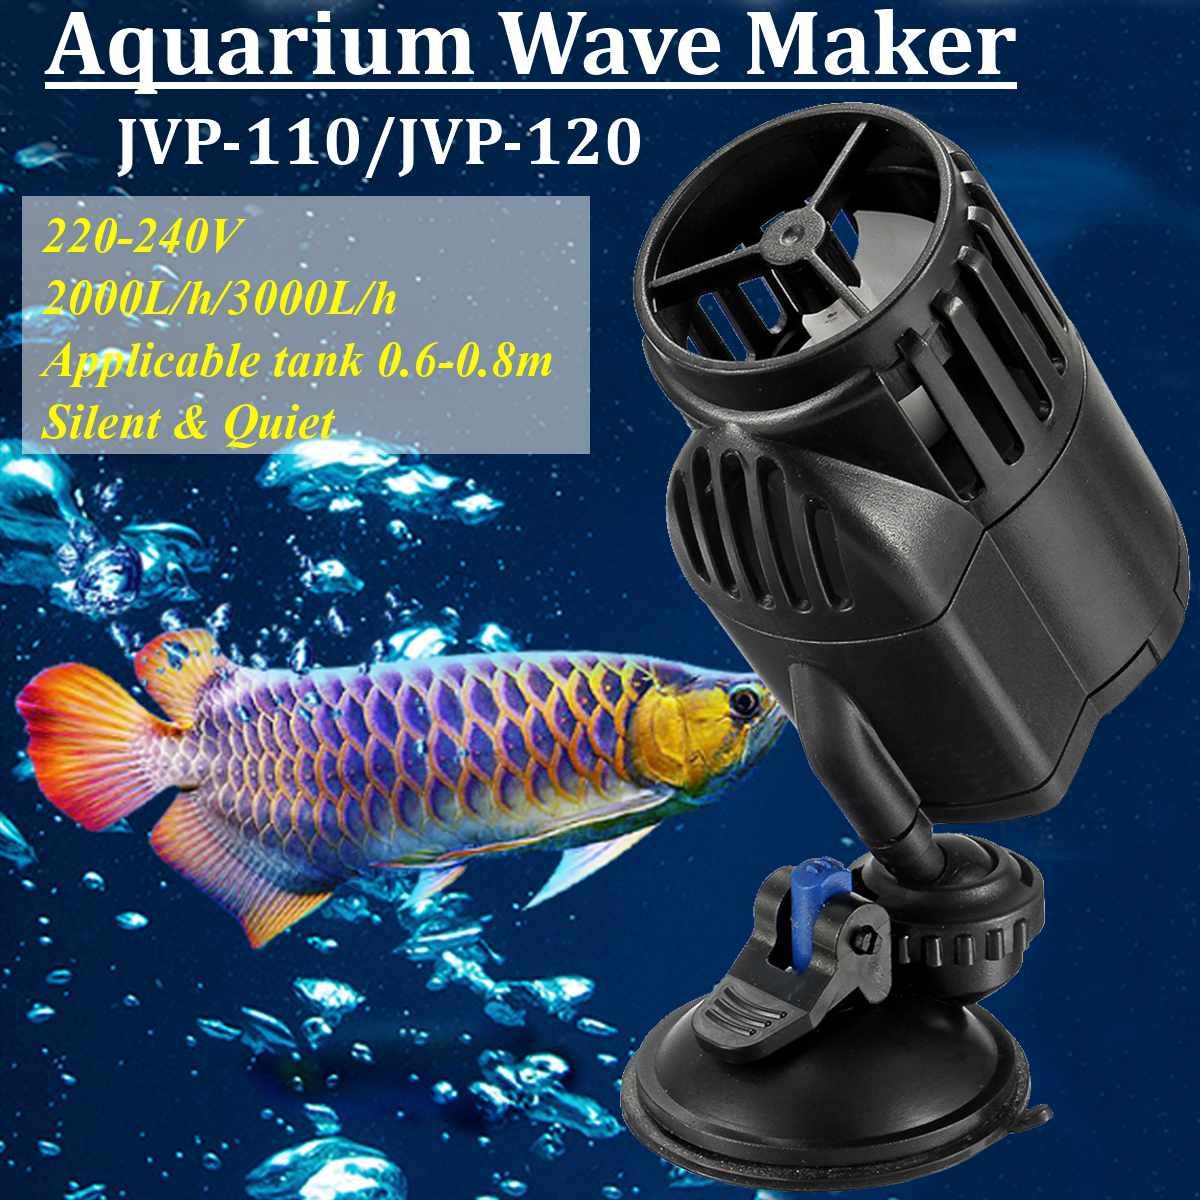 Aquarium Wave Maker Water Pump Marine Submersible Aquariums Pond Propeller Circulation Pumps Coral Reef Powerhead Fish Tank